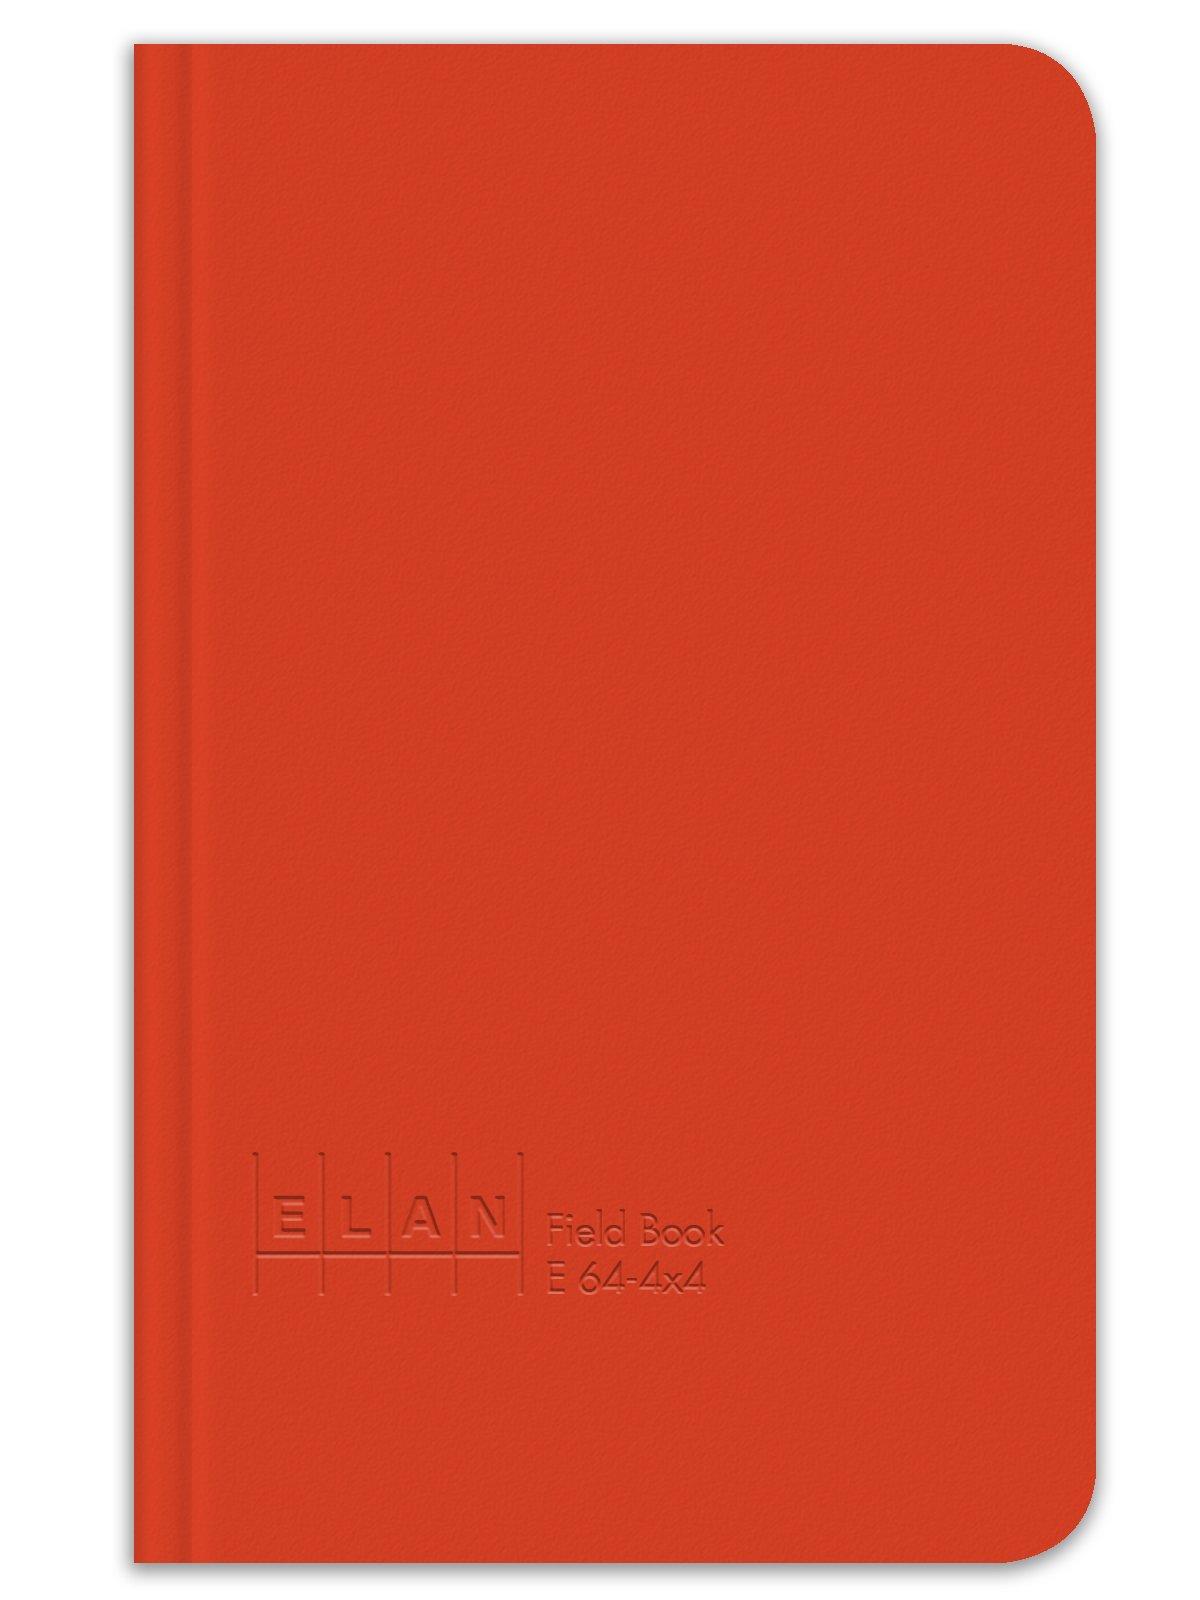 Elan Publishing Company E64-4x4 Field Surveying Book 4 ⅝ x 7 ¼, Bright Orange Cover (Pack of 6) by Elan Publishing Company